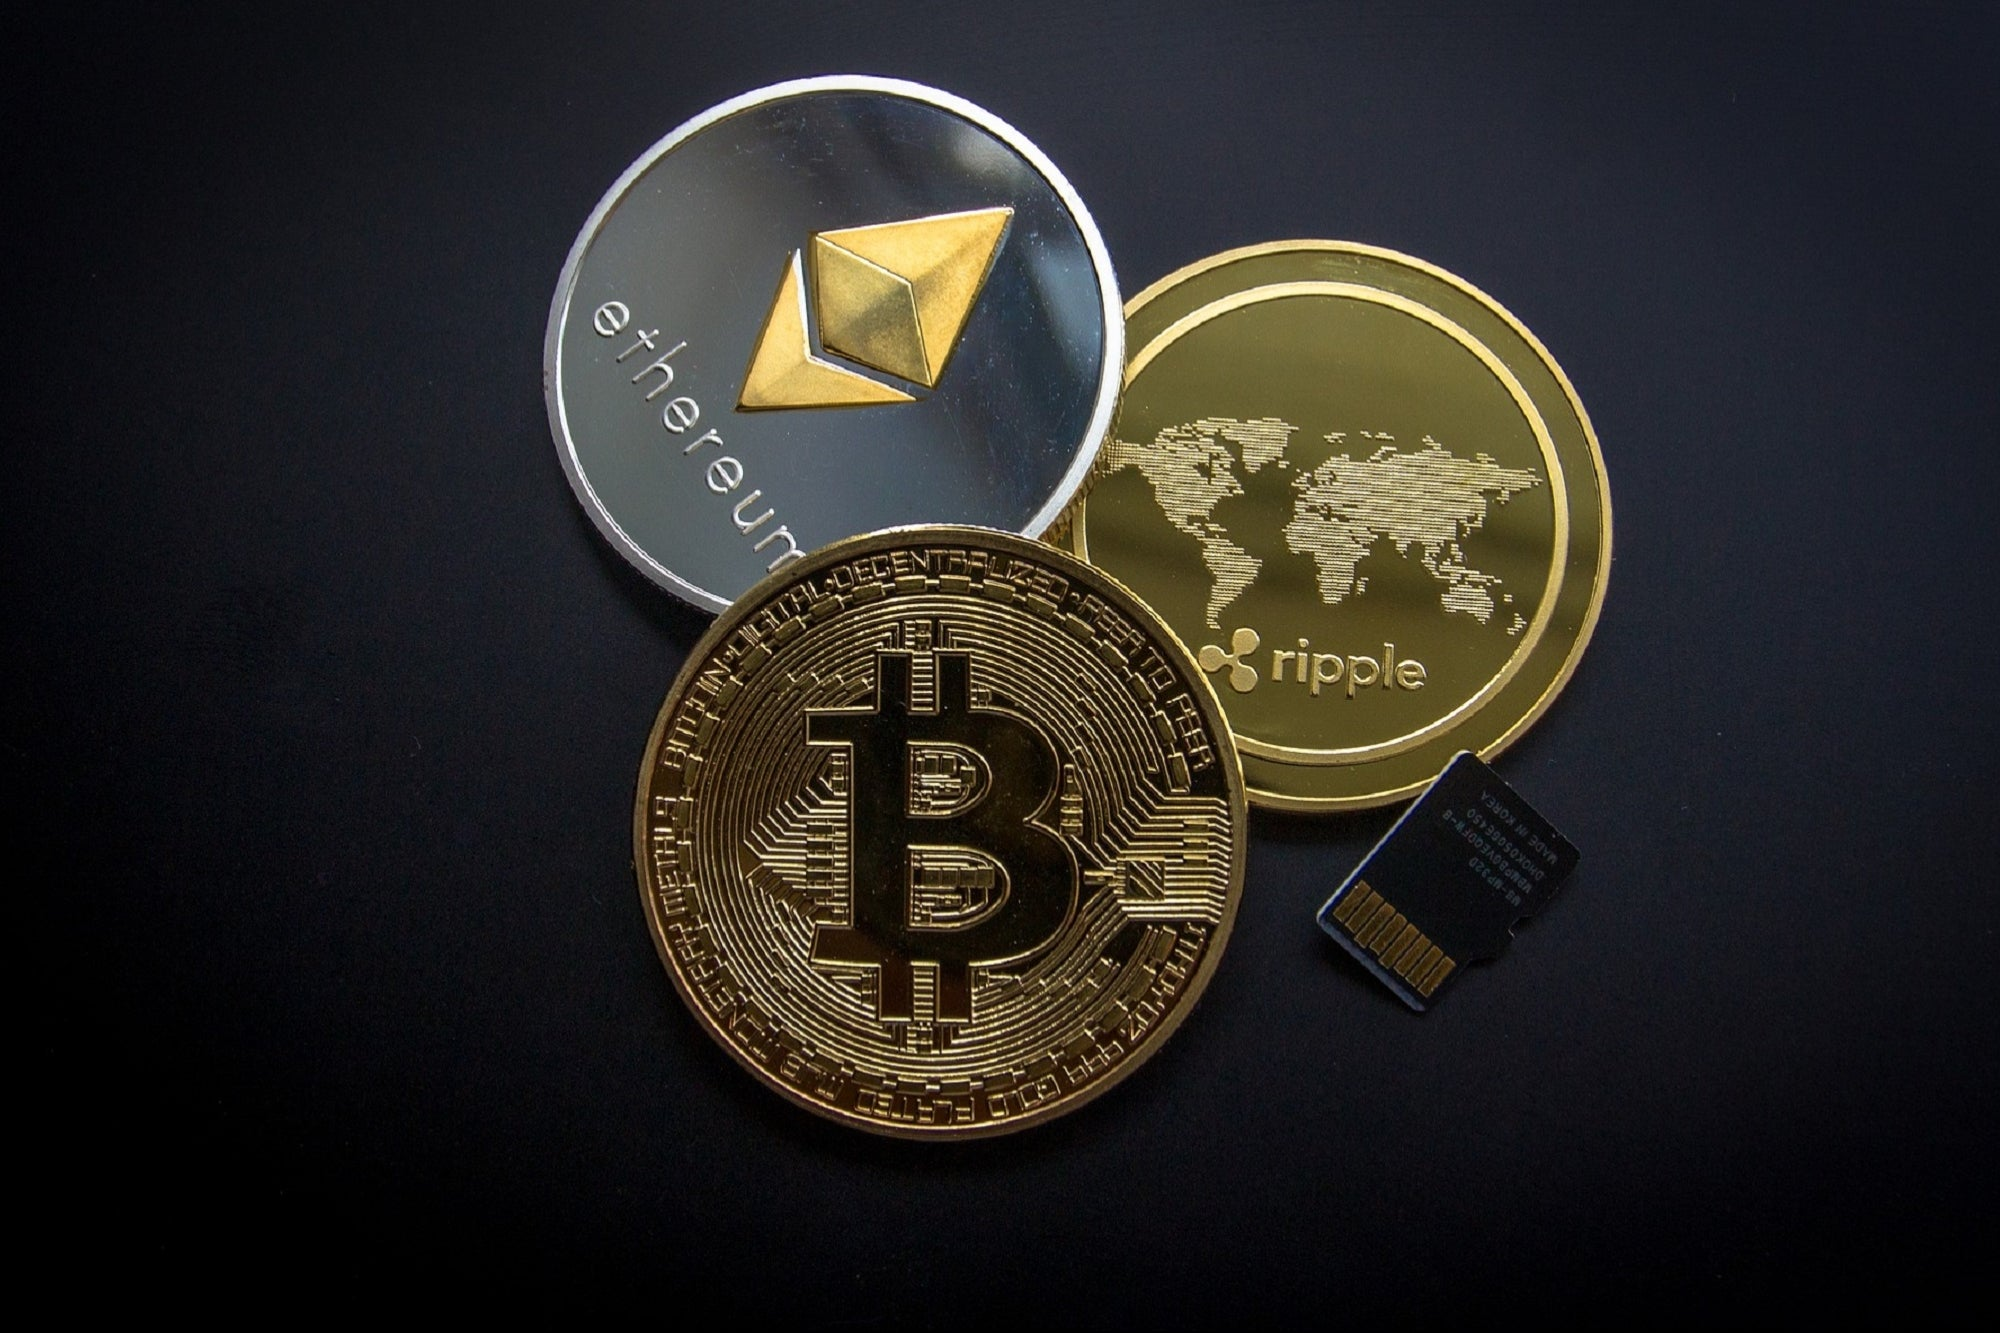 valore totale di tutte cryptocurrencies